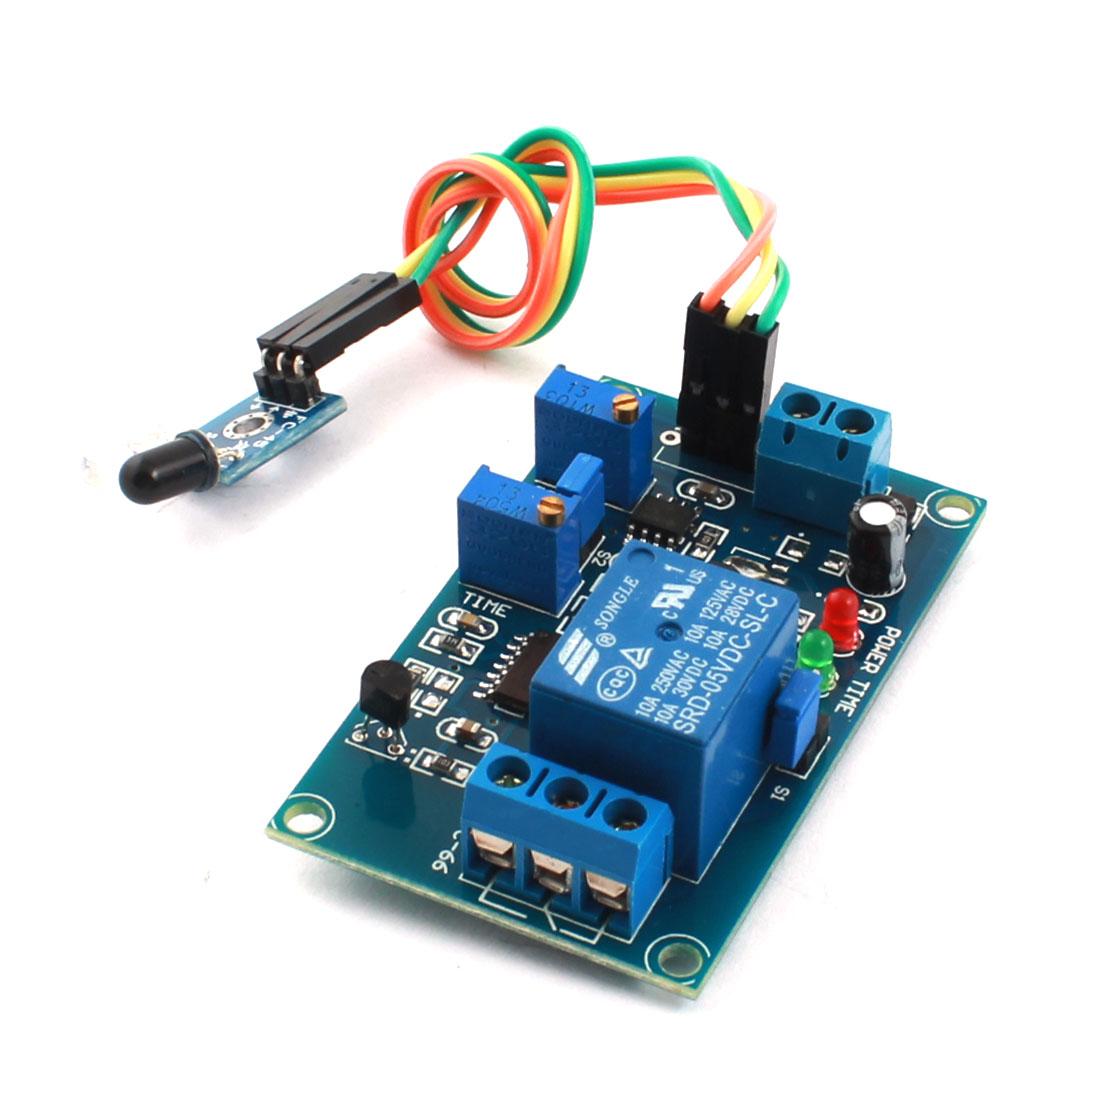 DC5V 1 Channel Non-reflection Trigger Infrared Reciever Time Delay Relay PCB Board Module